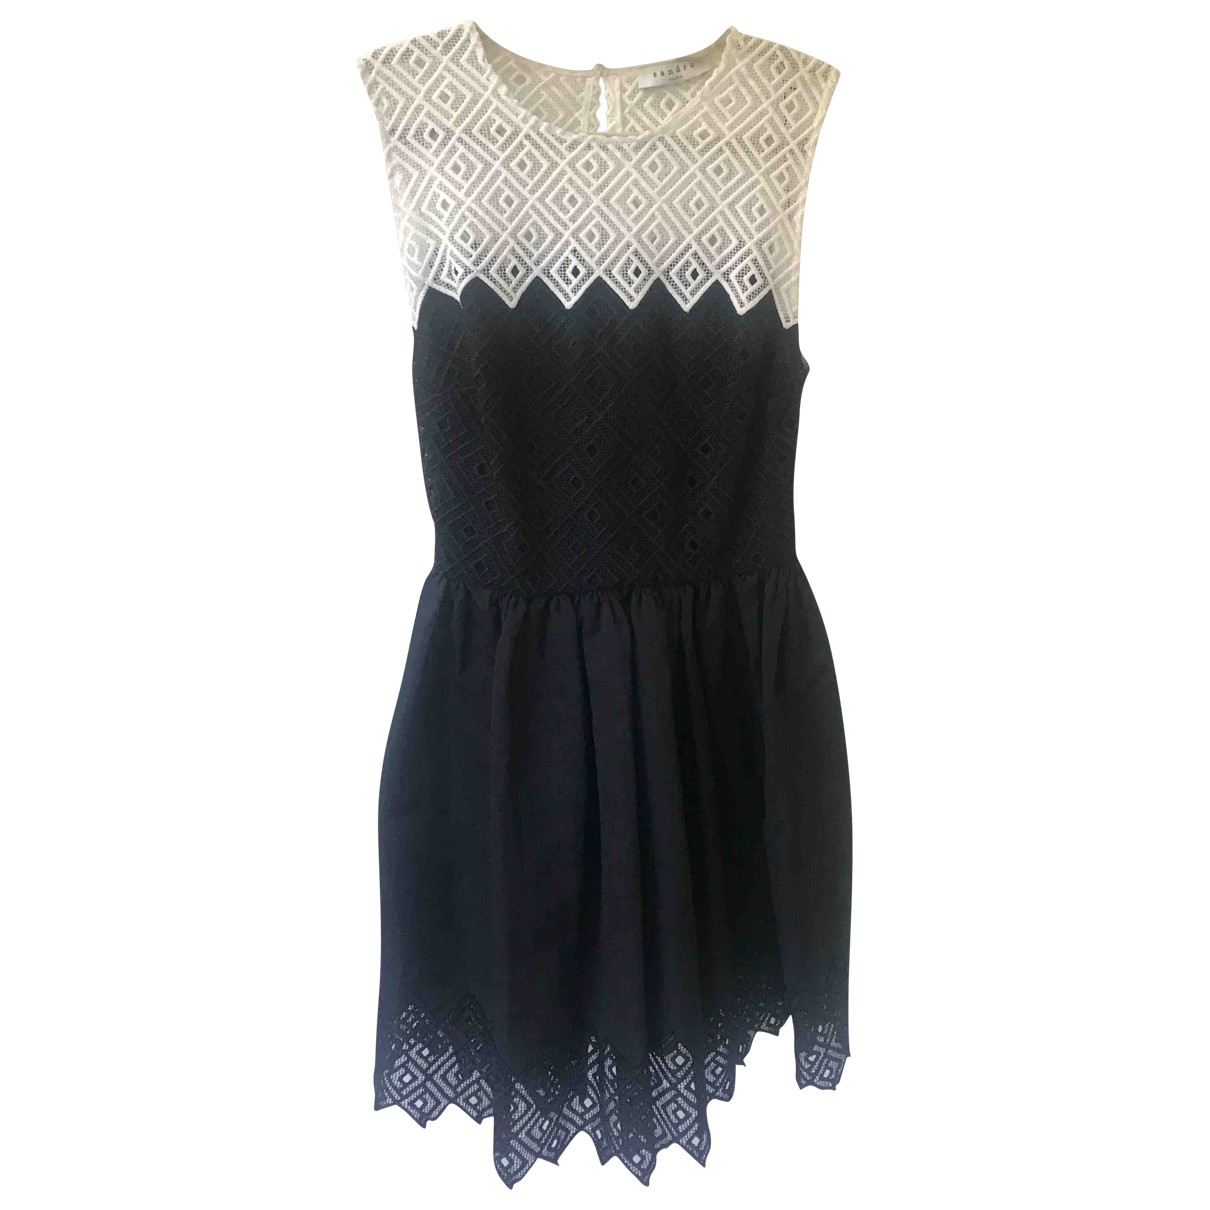 Sandro \N Multicolour Lace dress for Women 12 UK